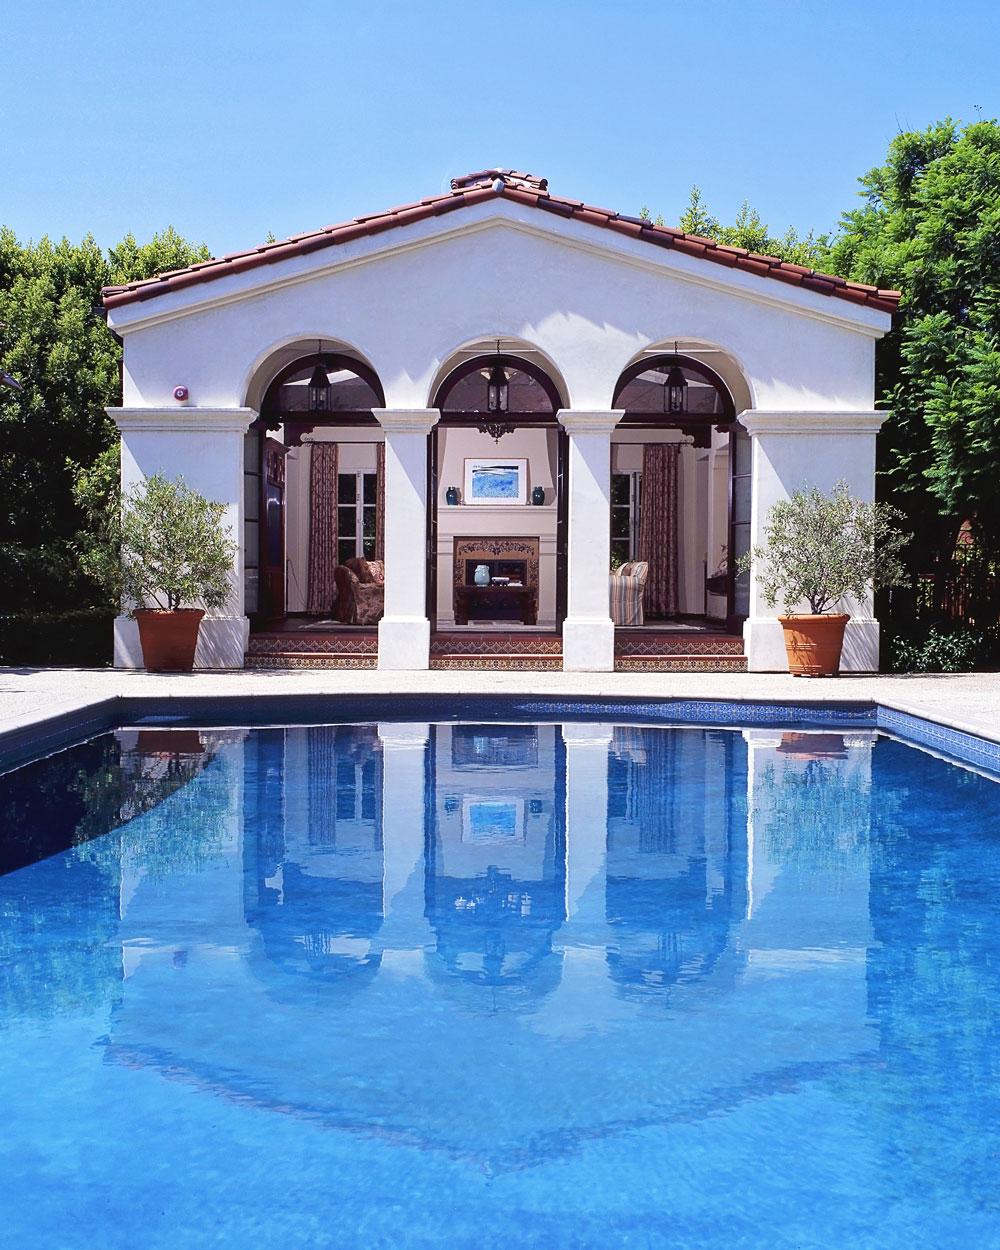 10-pool-poolhouse-exterior-spanish-dee-carawan.jpg